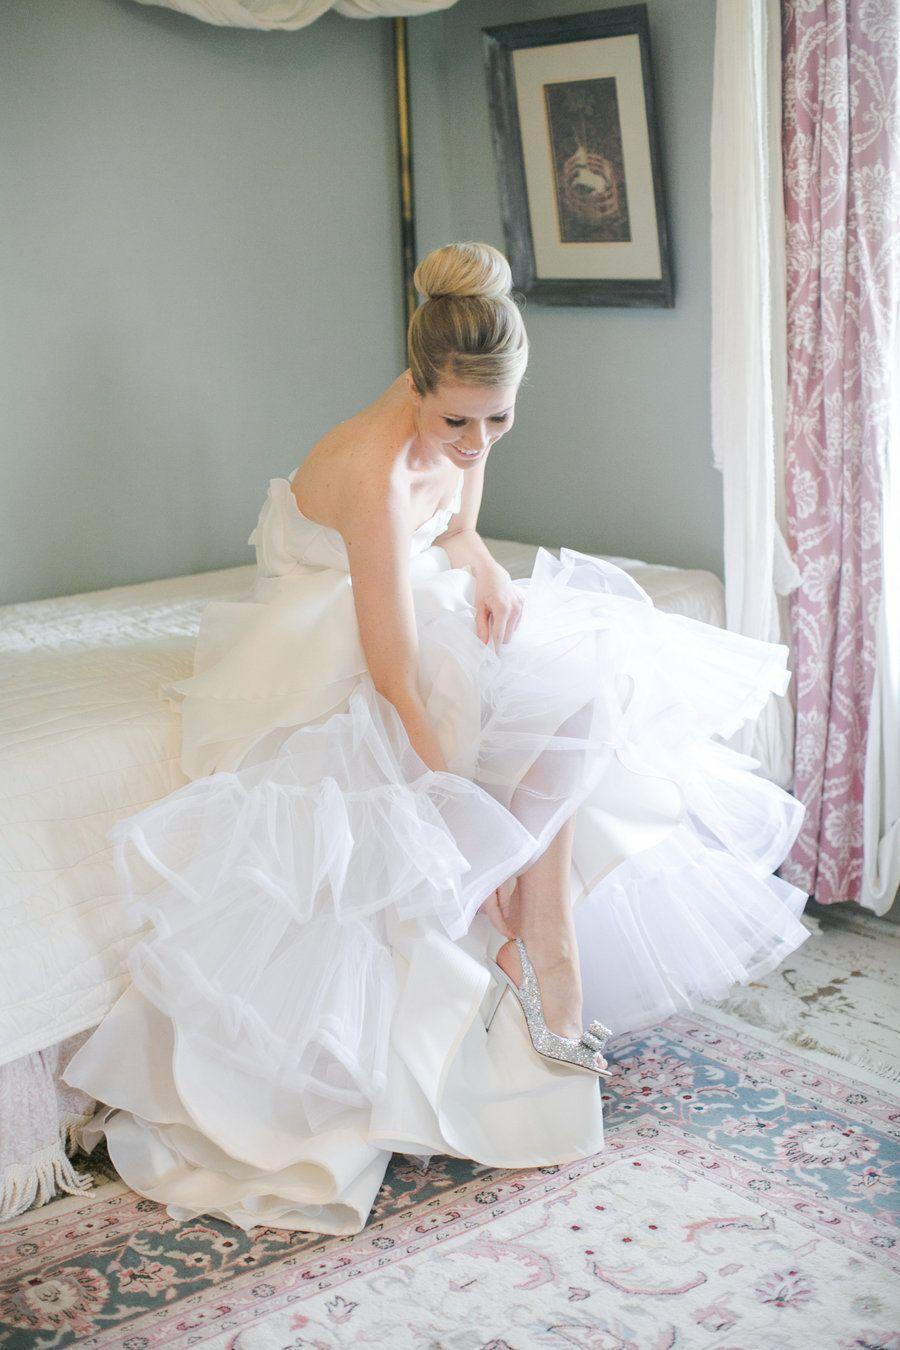 Austin Wedding from The Nouveau Romantics + Caroline Joy Photography |   Read more - http://www.stylemepretty.com/2013/08/13/austin-wedding-from-the-nouveau-romantics-caroline-joy-photography/